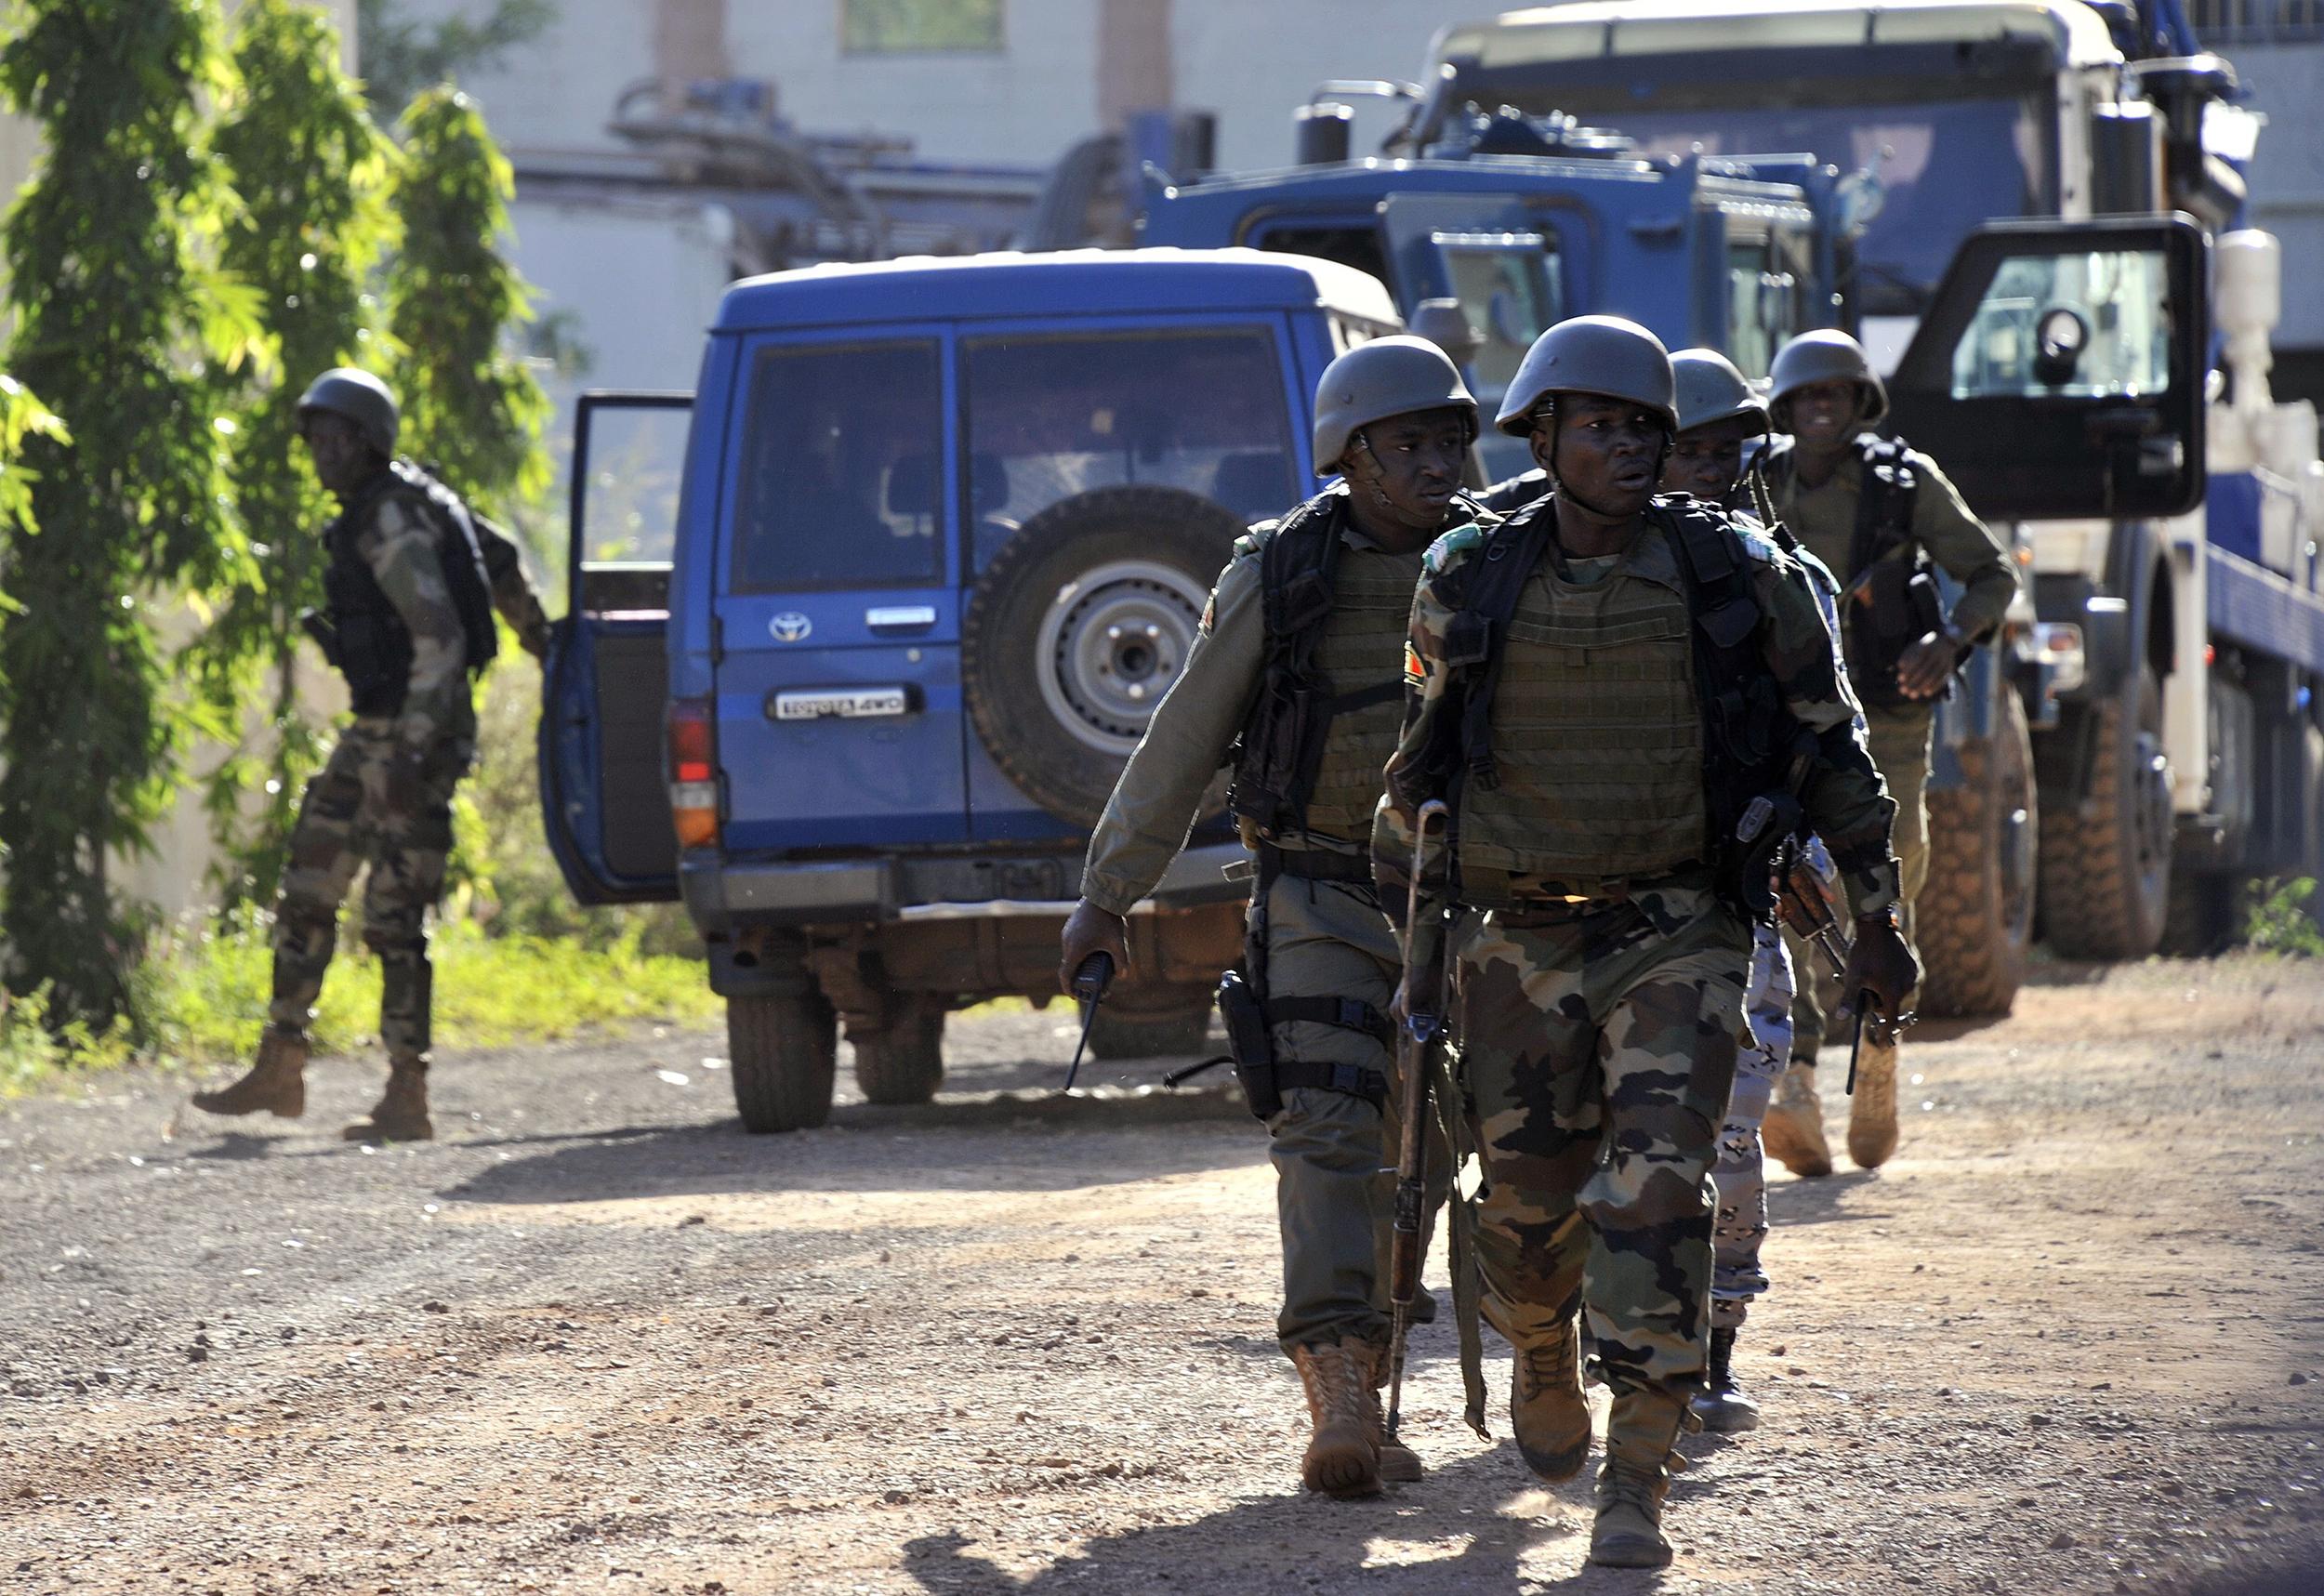 Malian troops take position near the Radisson Blu hotel in Bamako, Mali on Nov. 20, 2015.